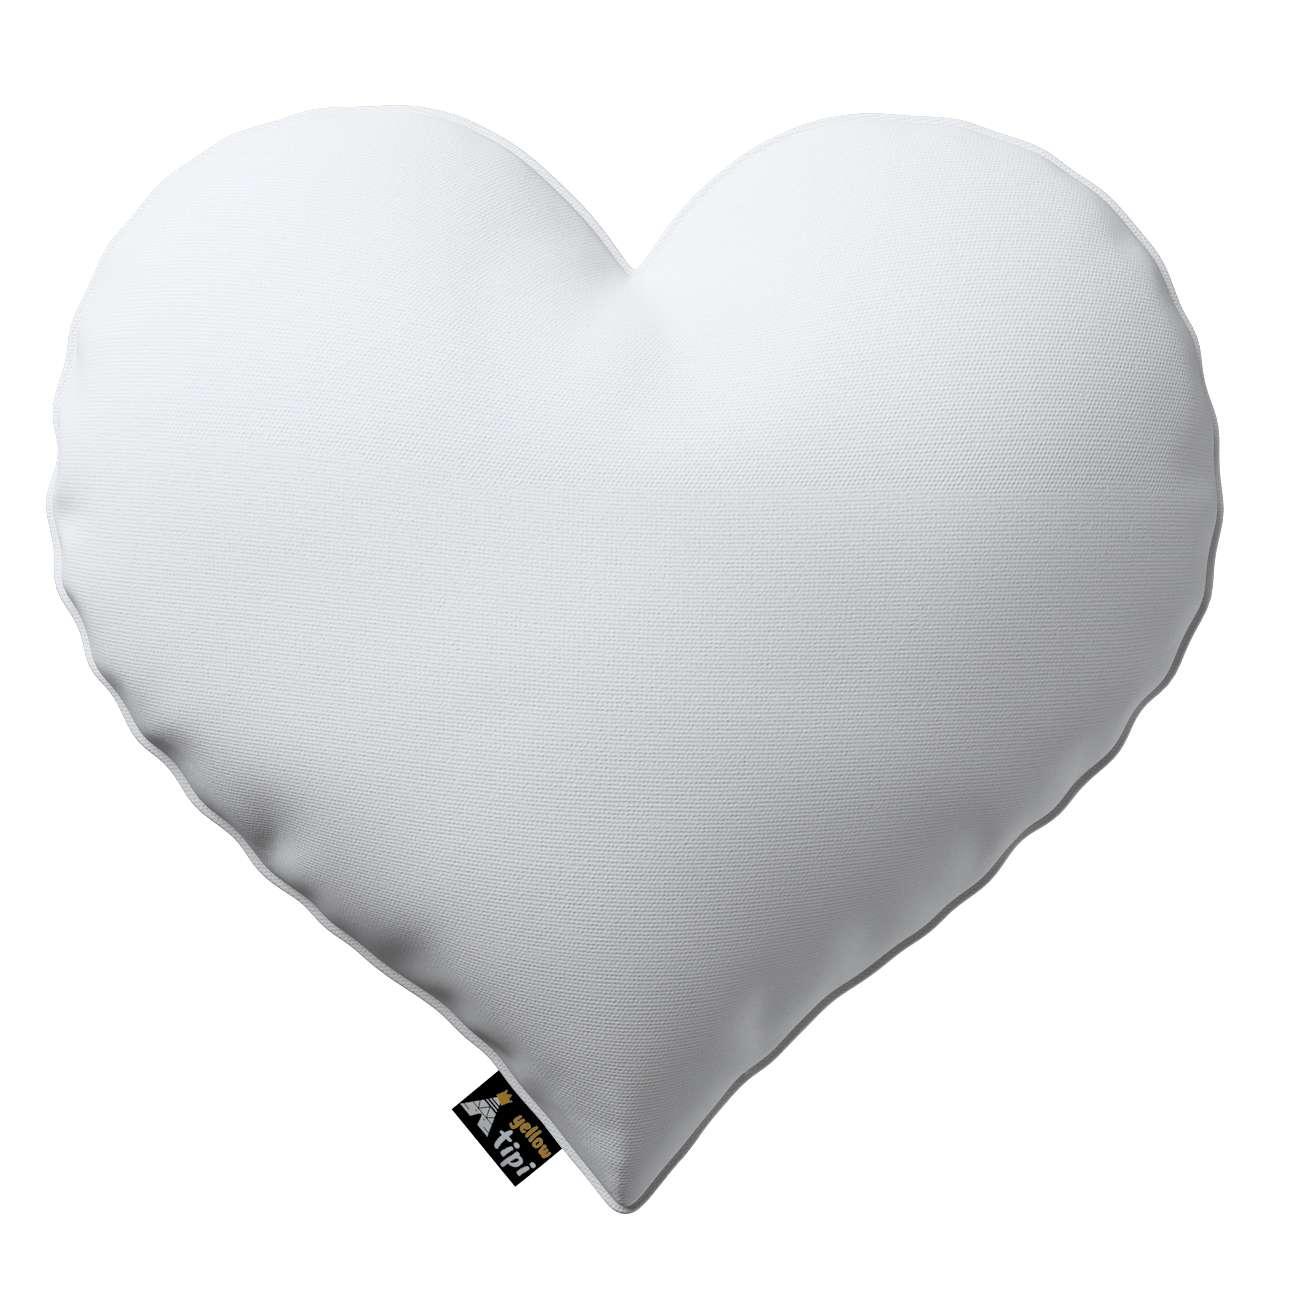 Heart of Love pagalvėlė kolekcijoje Happiness, audinys: 133-02